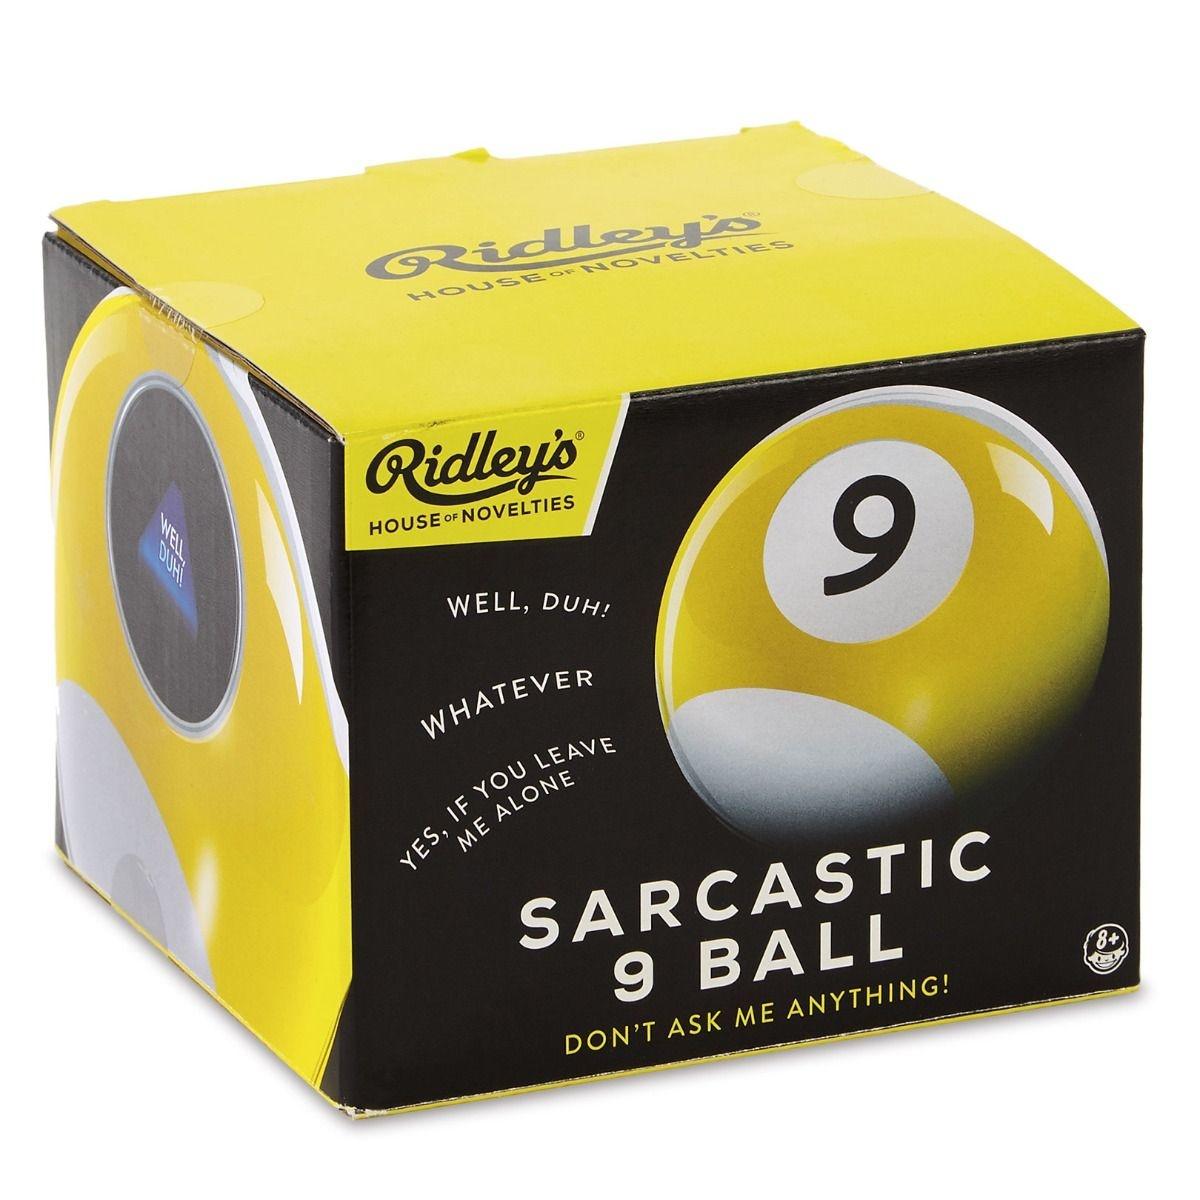 Ridley's Sarcastic 9 Ball-1